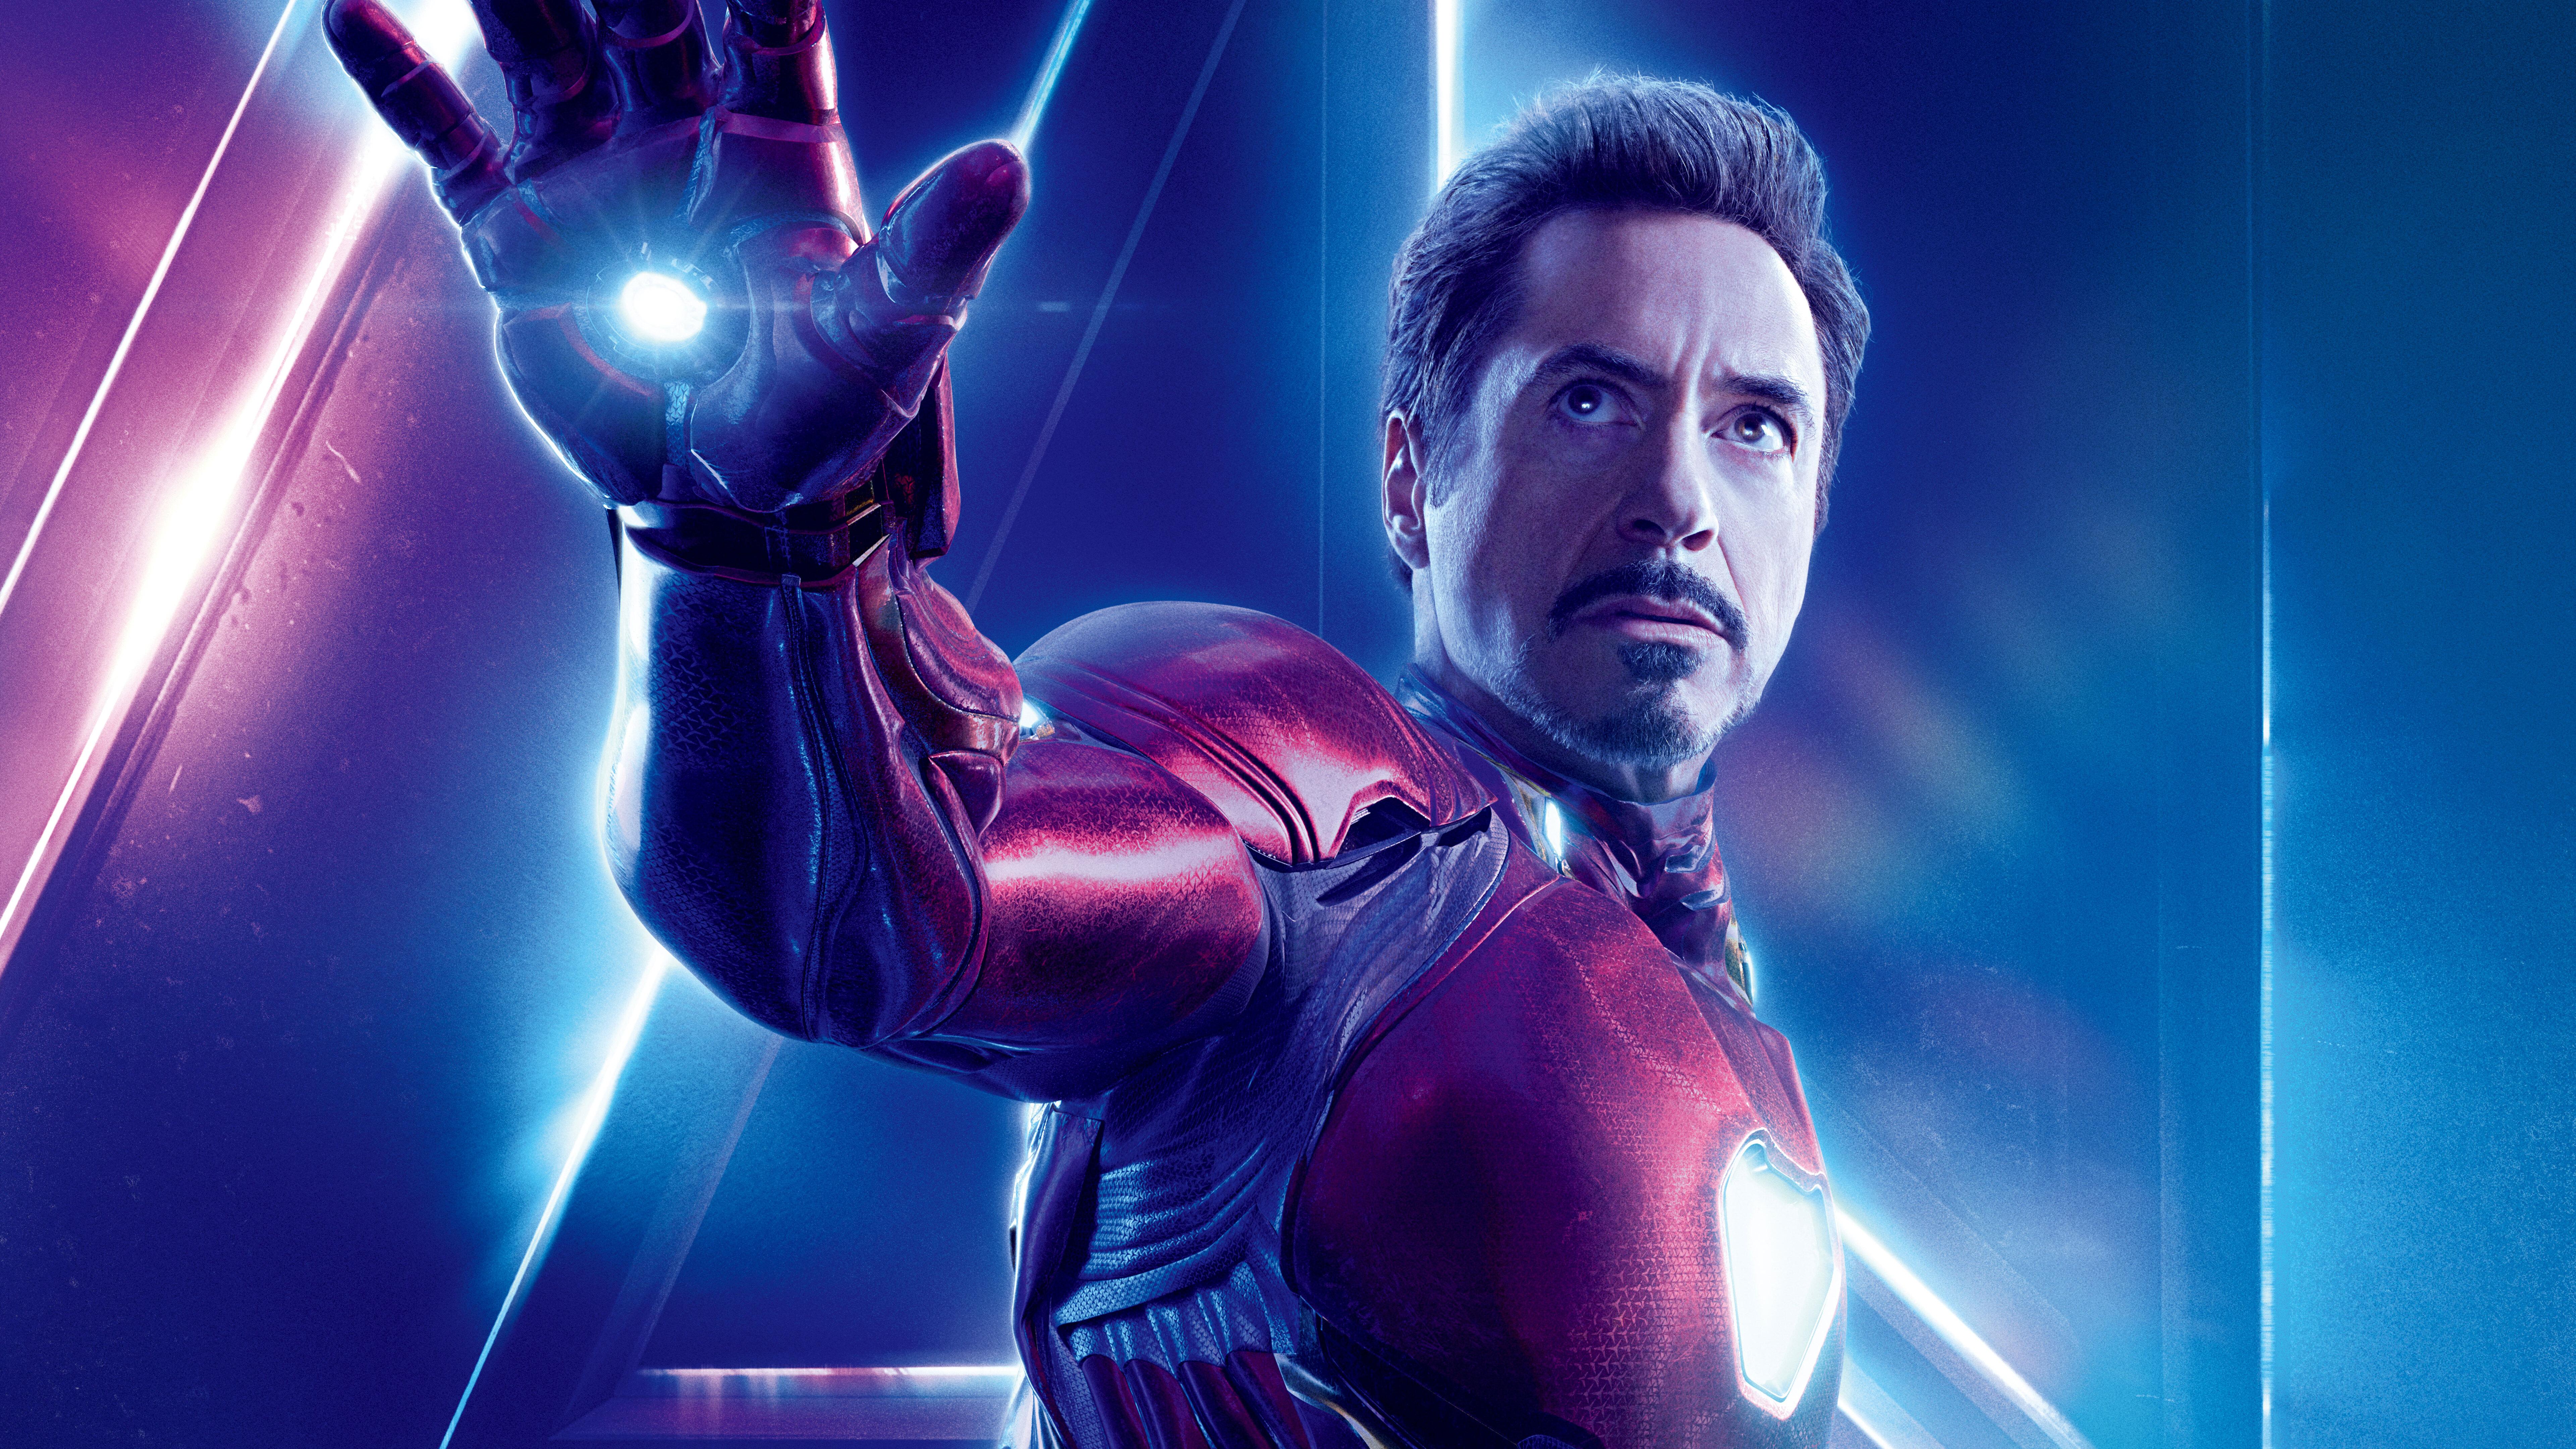 7680x4320 Iron Man In Avengers Infinity War 8k Poster 8k Hd 4k